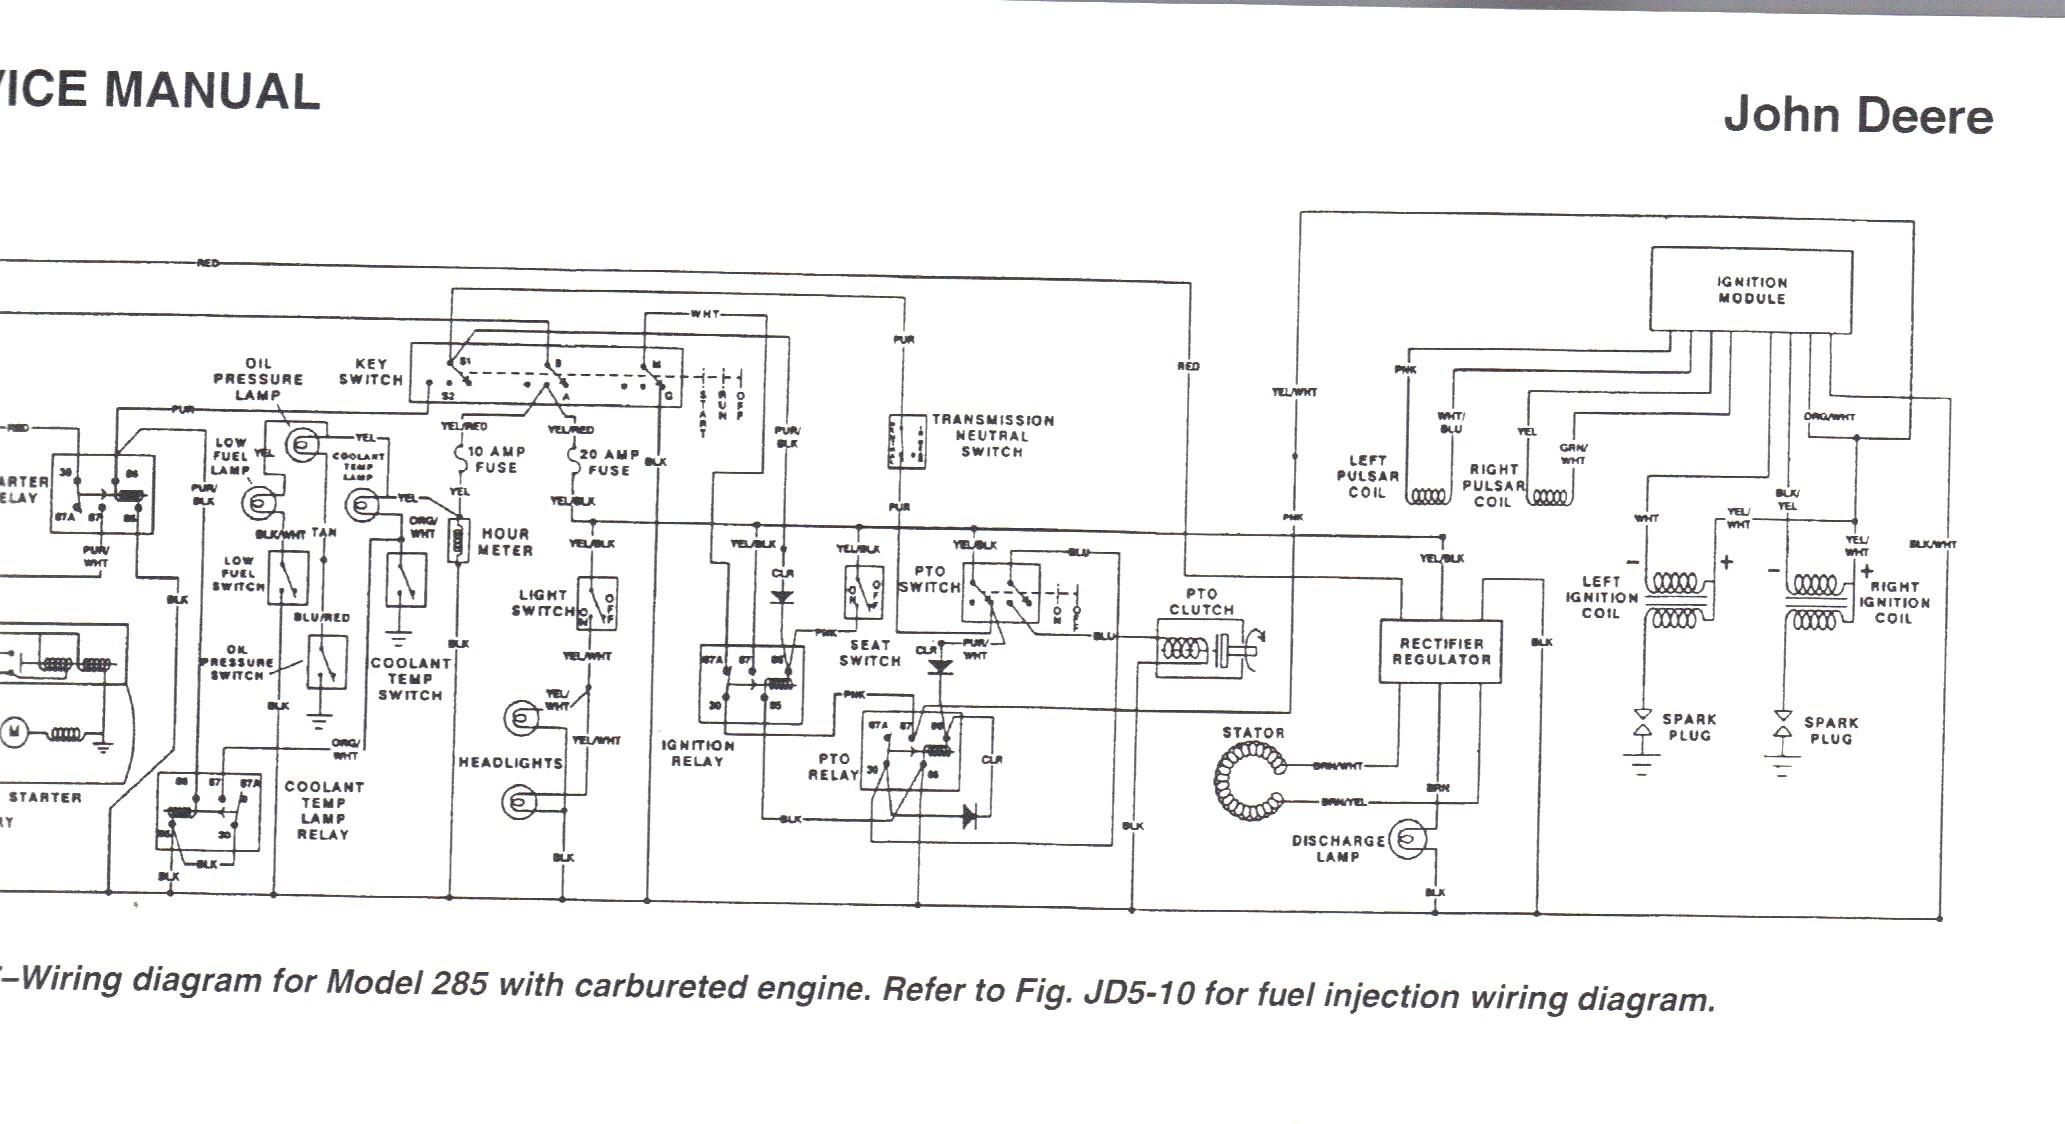 John Deere La105 Engine Diagram